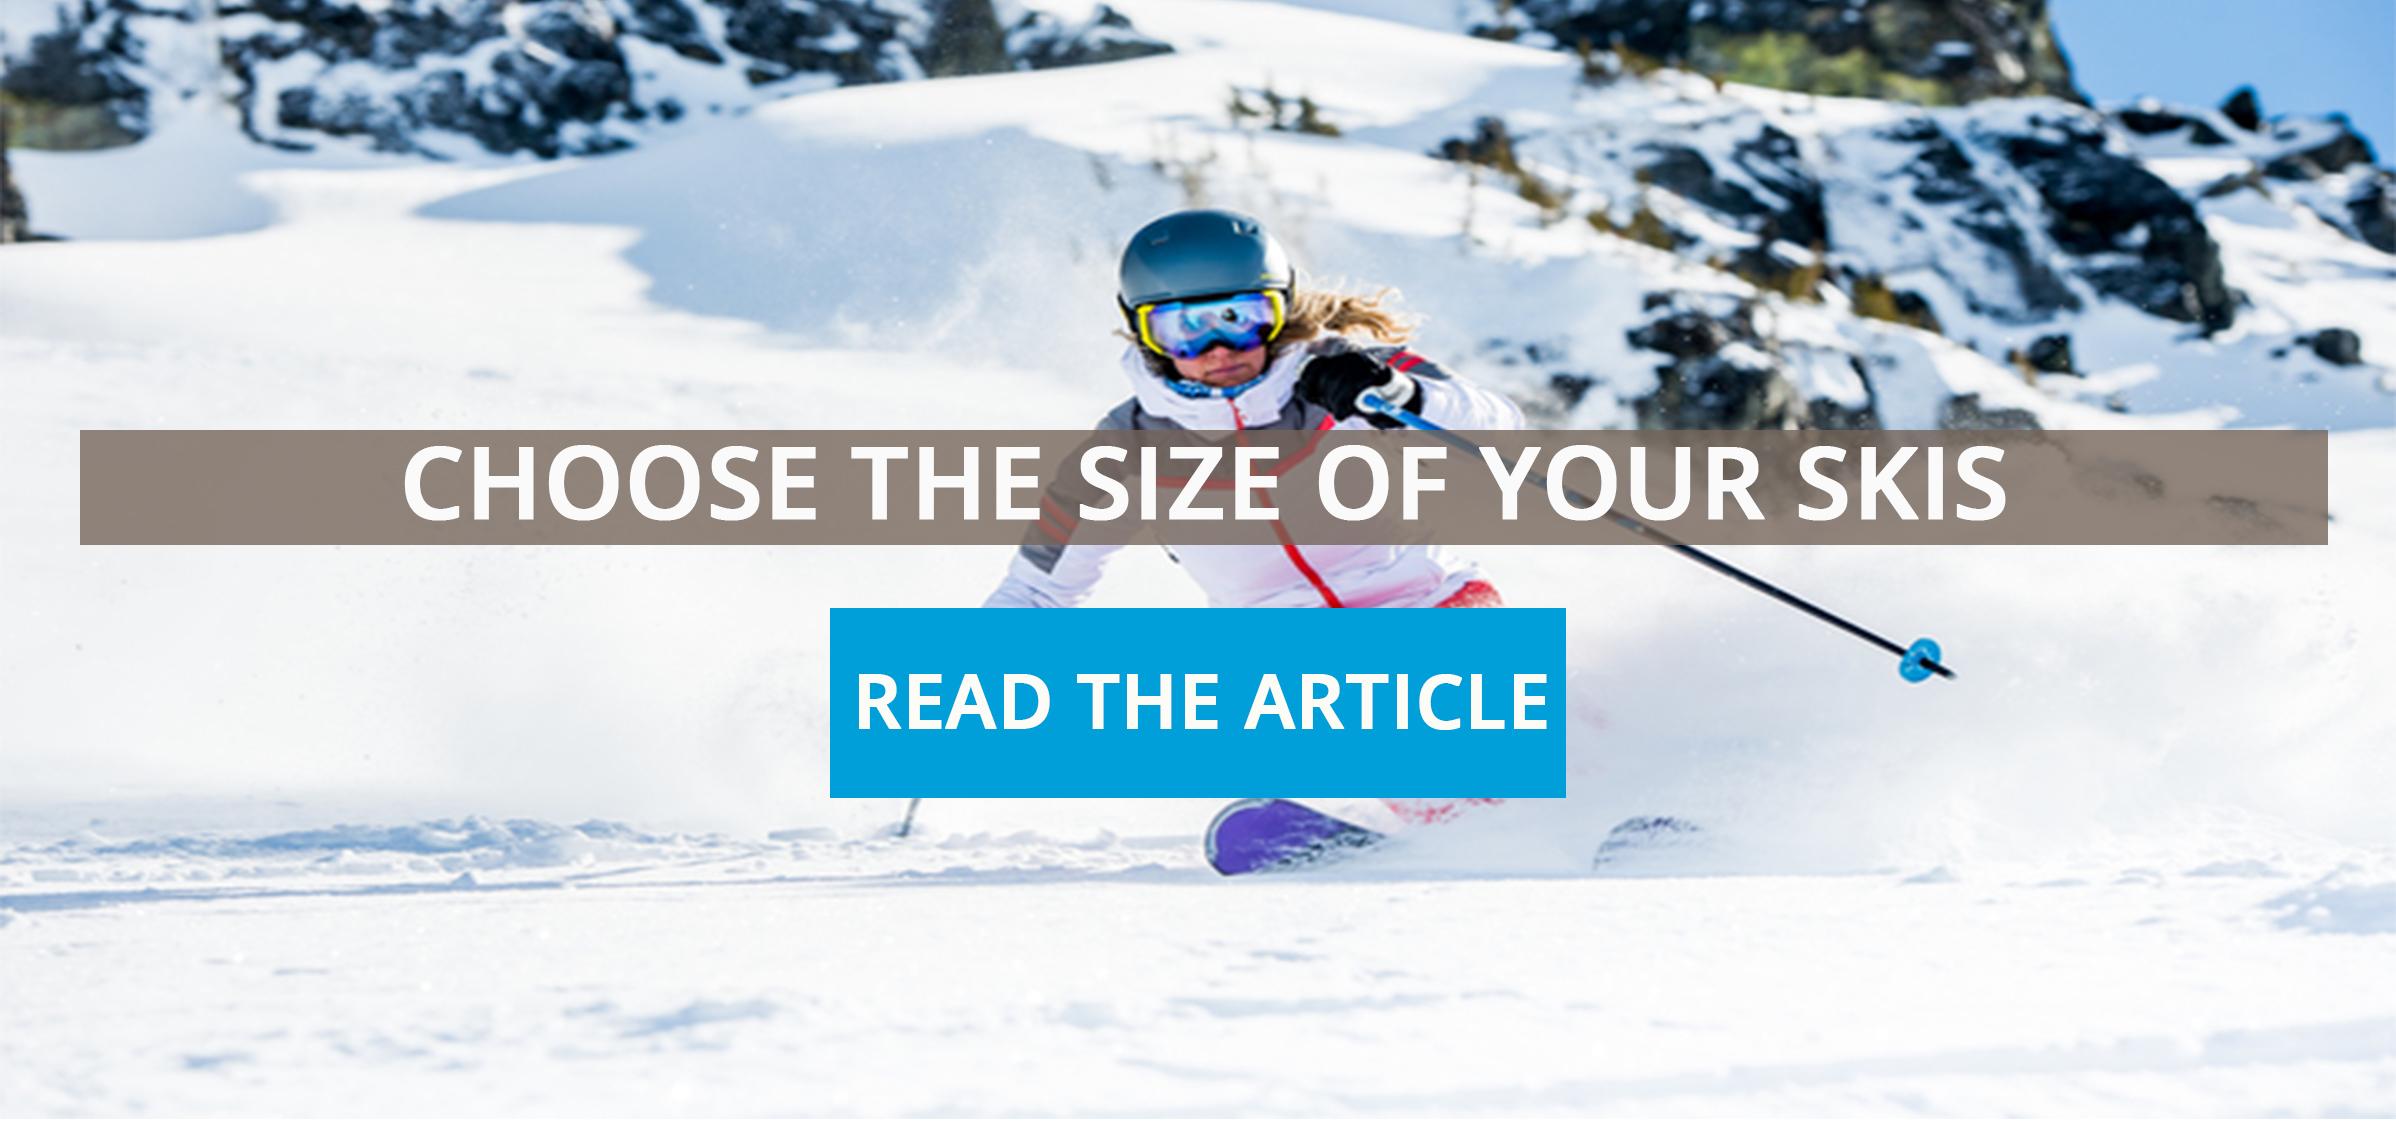 choose-skis-size